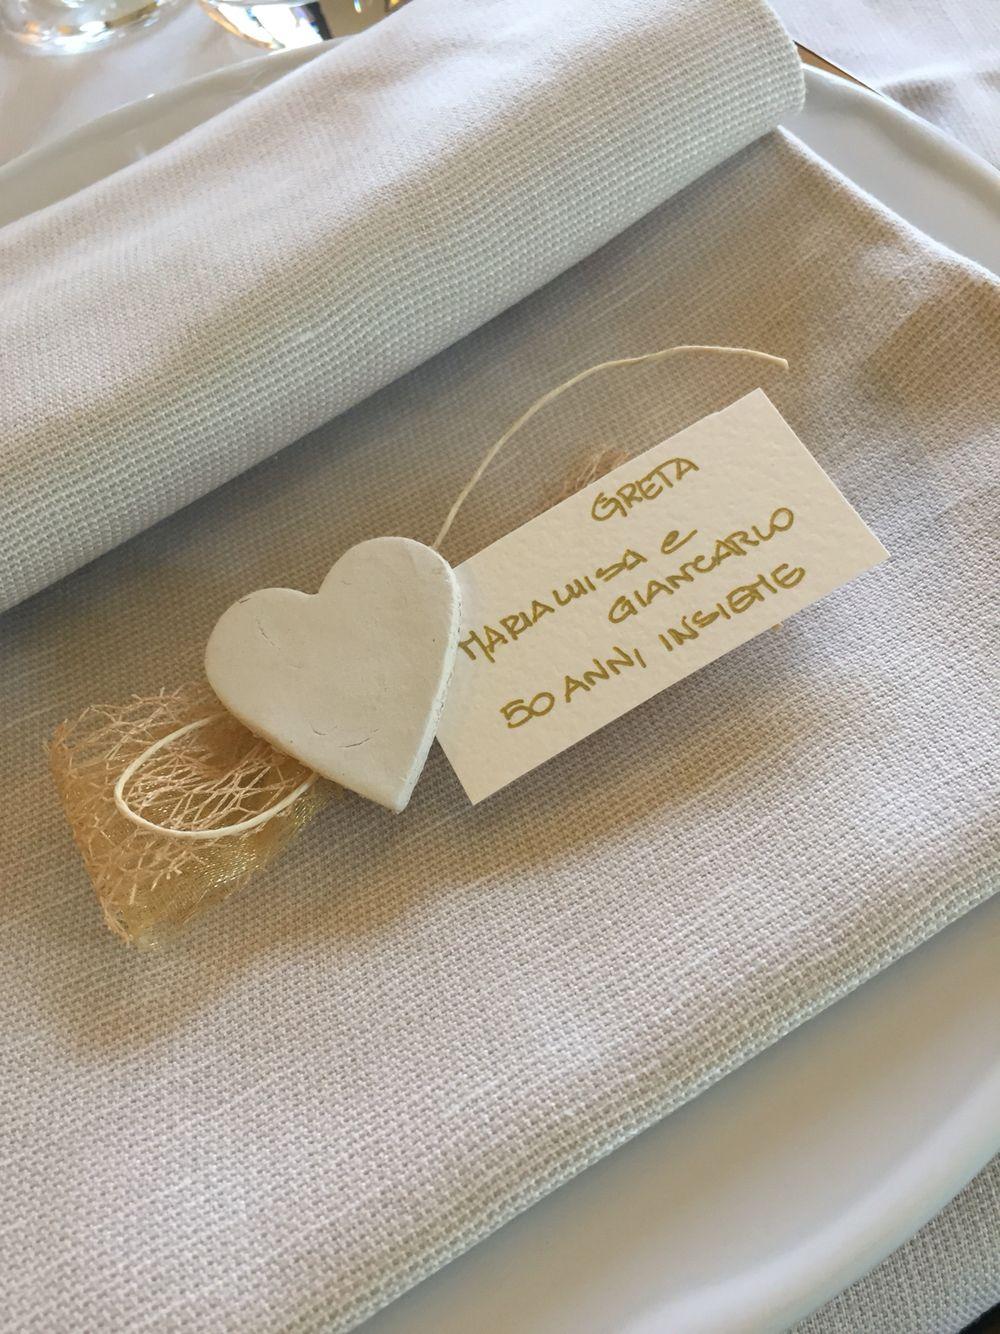 Segnaposto Matrimonio Pinterest.Segnaposto Handmade Oro Nozzeoro Anniversario Segnaposto